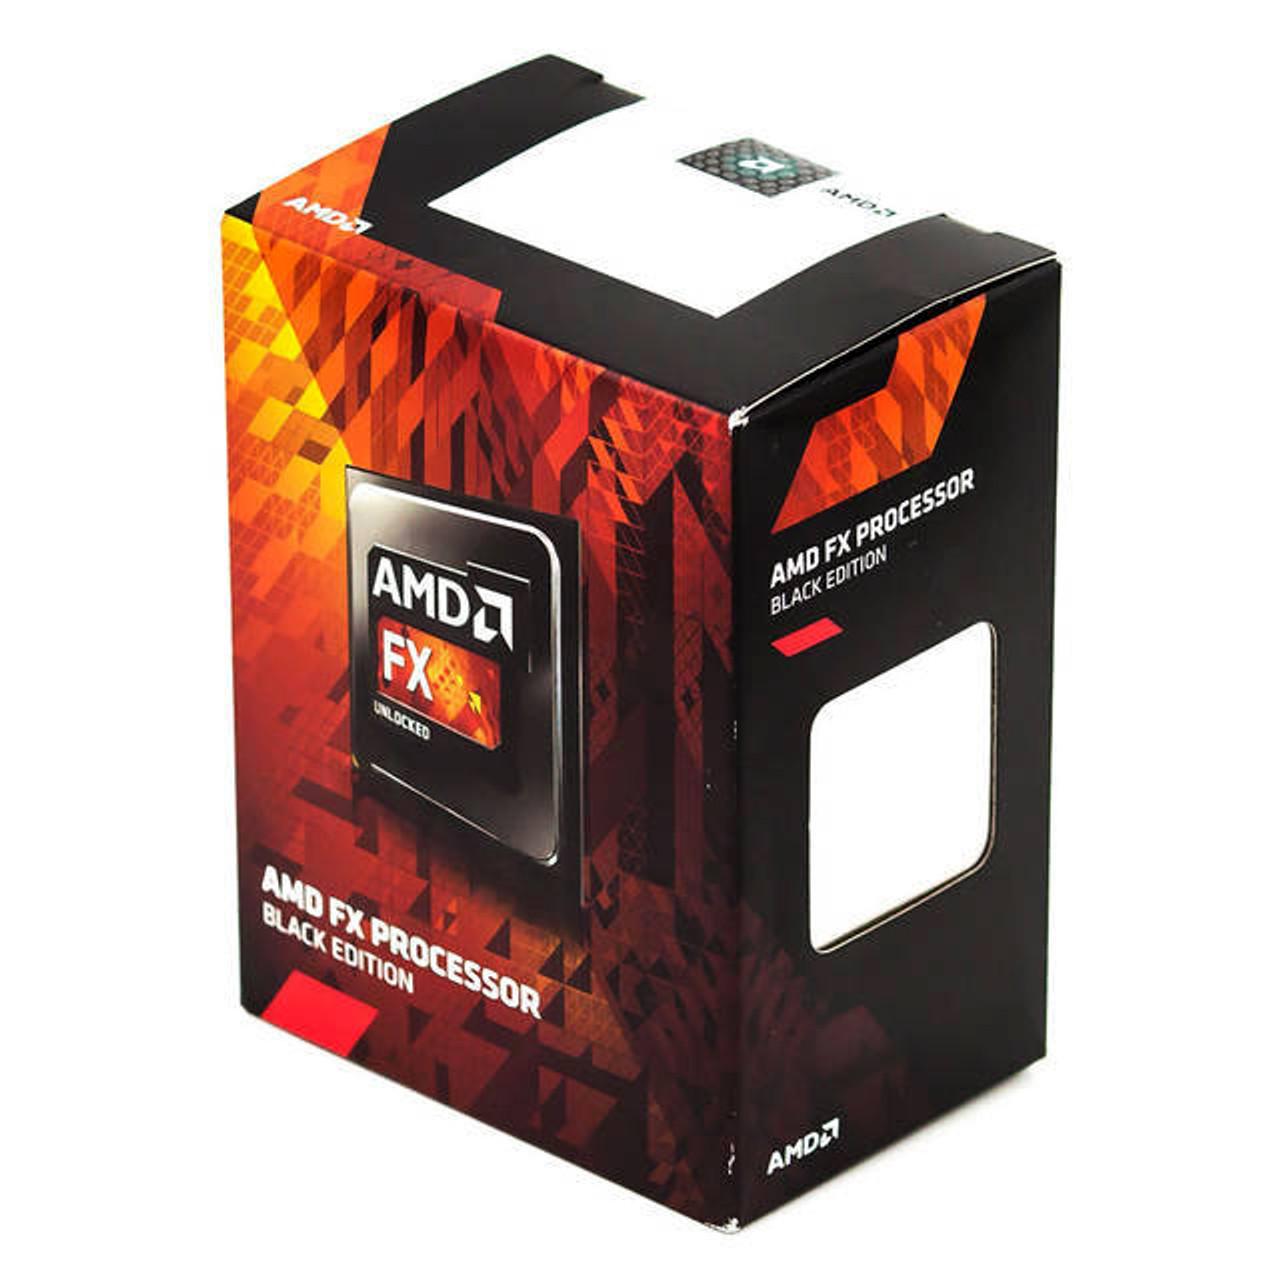 Fd832ewmhkbox Amd Fx 8320e Eight Core Vishera Processor 3 2ghz Socket Am3 Retail